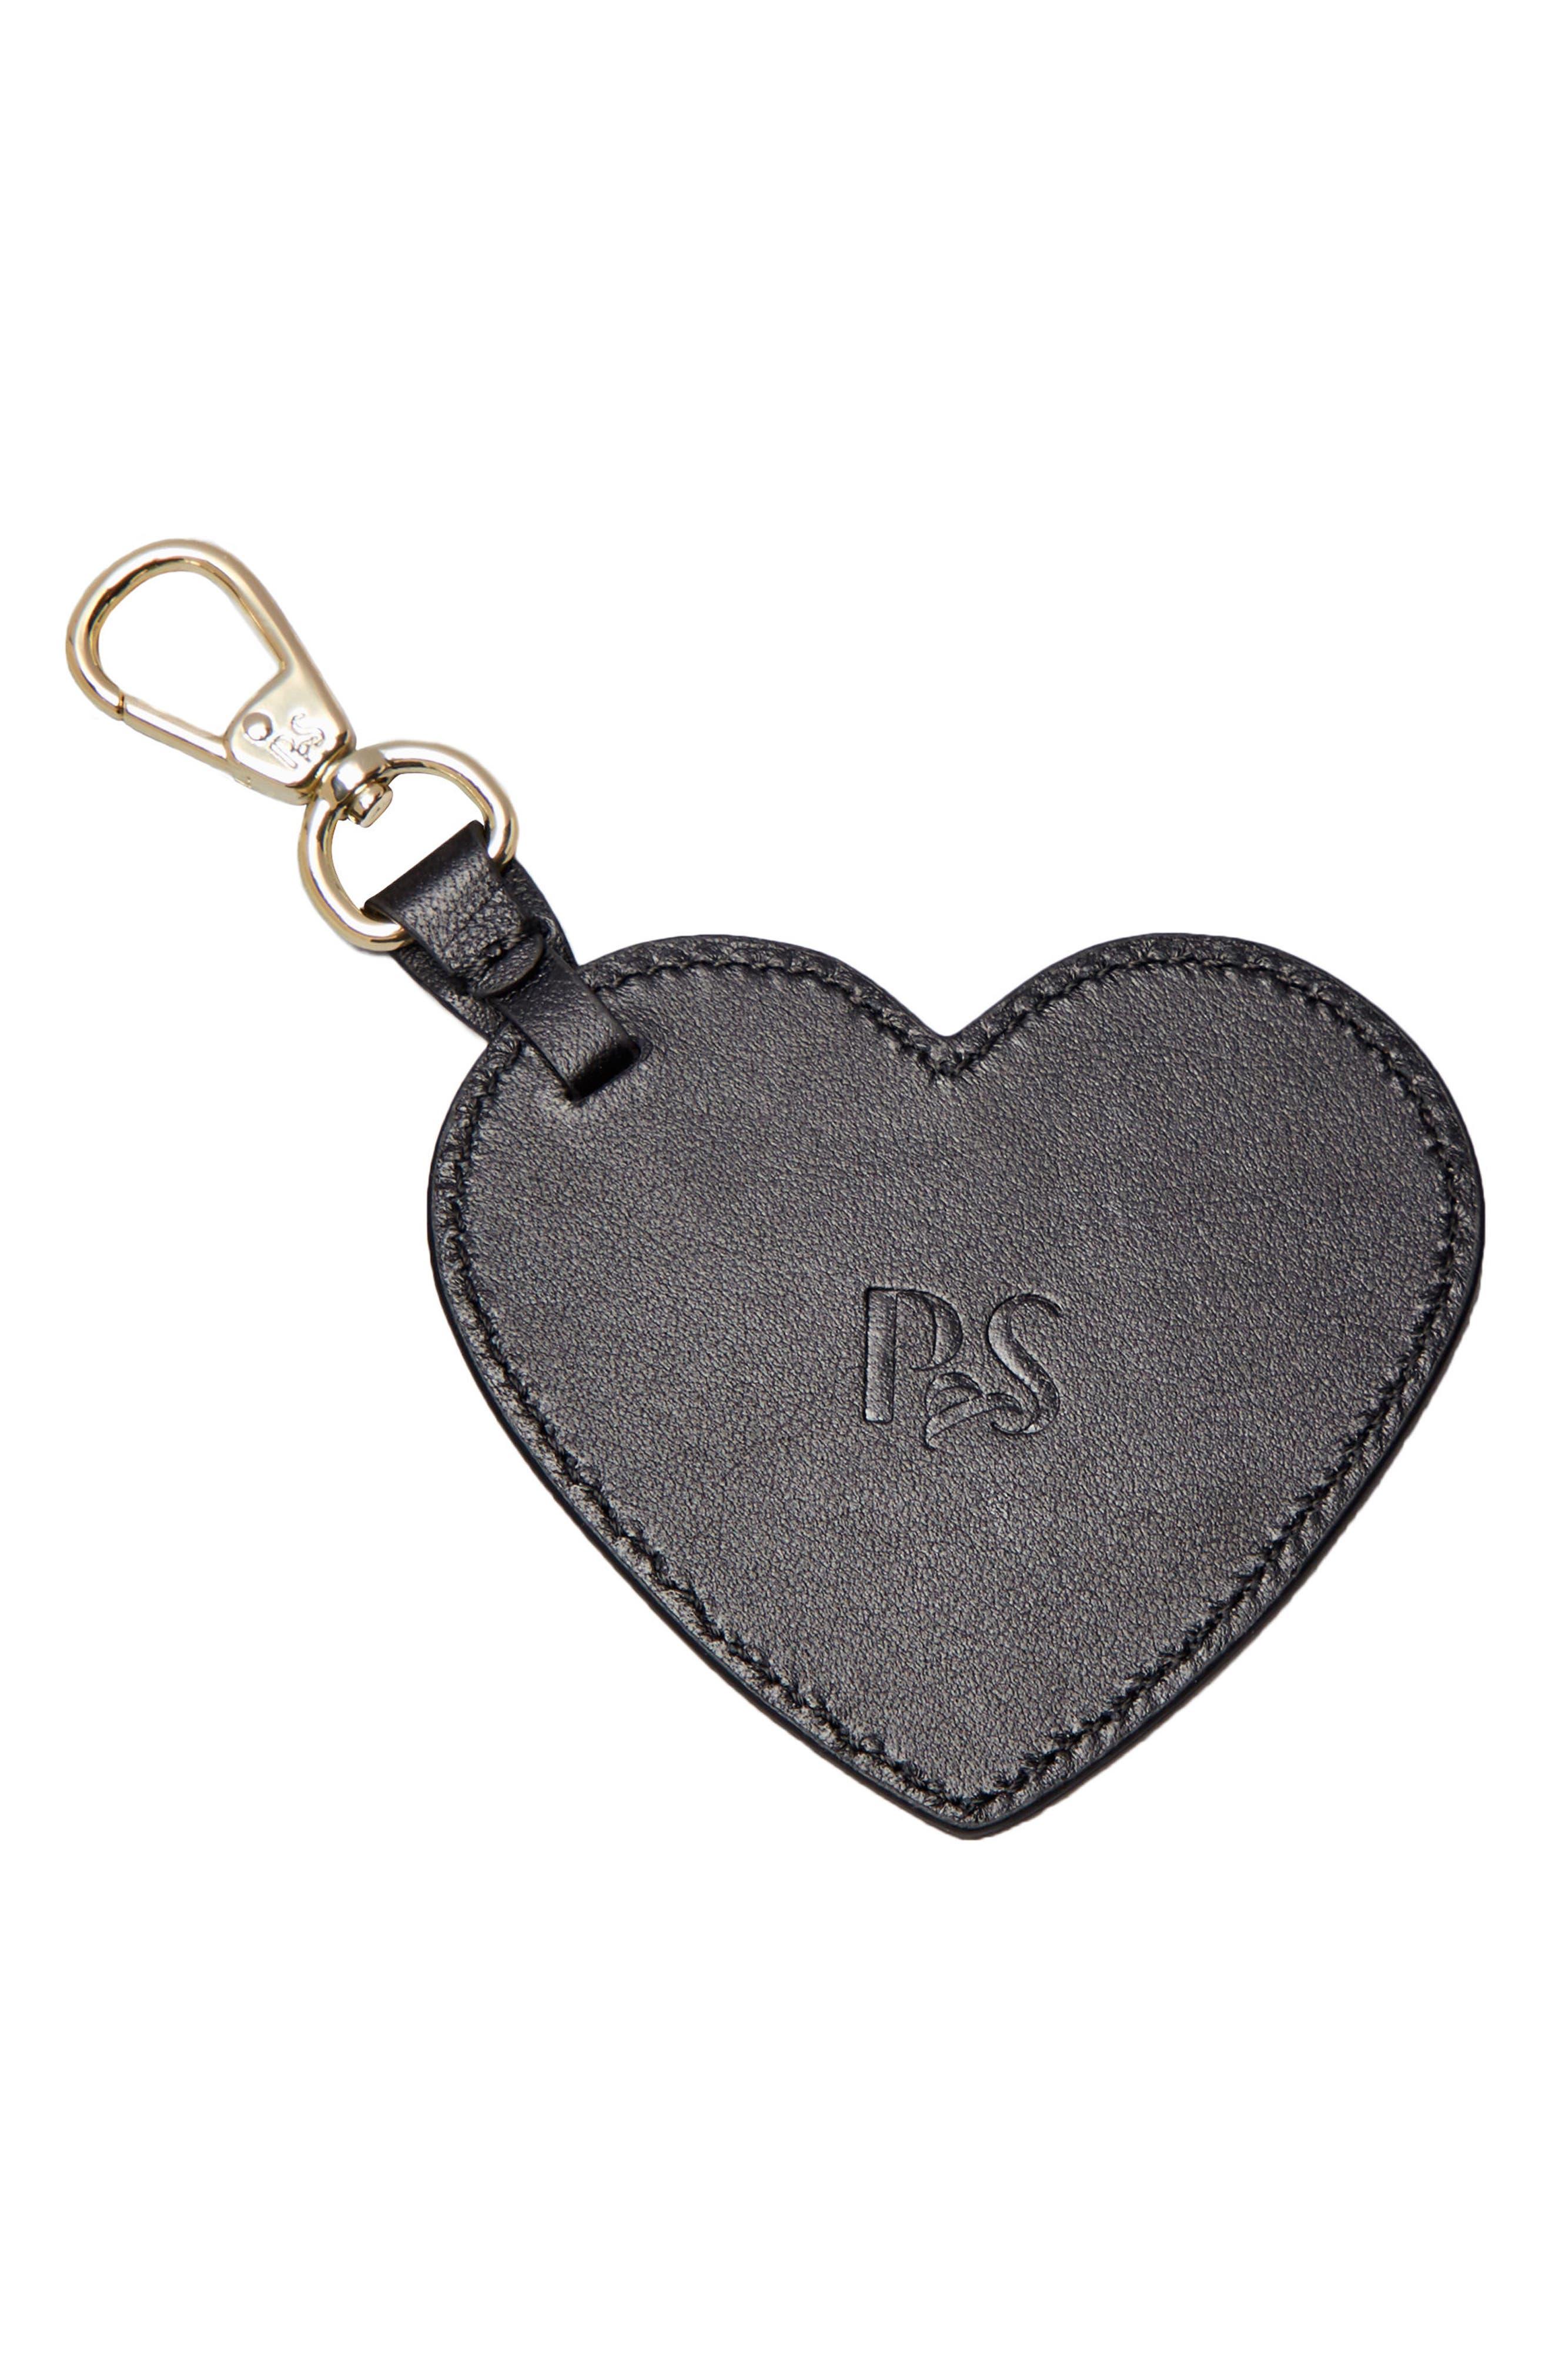 Smaller Heart Personalized Bag Charm,                             Alternate thumbnail 2, color,                             Noir/ White